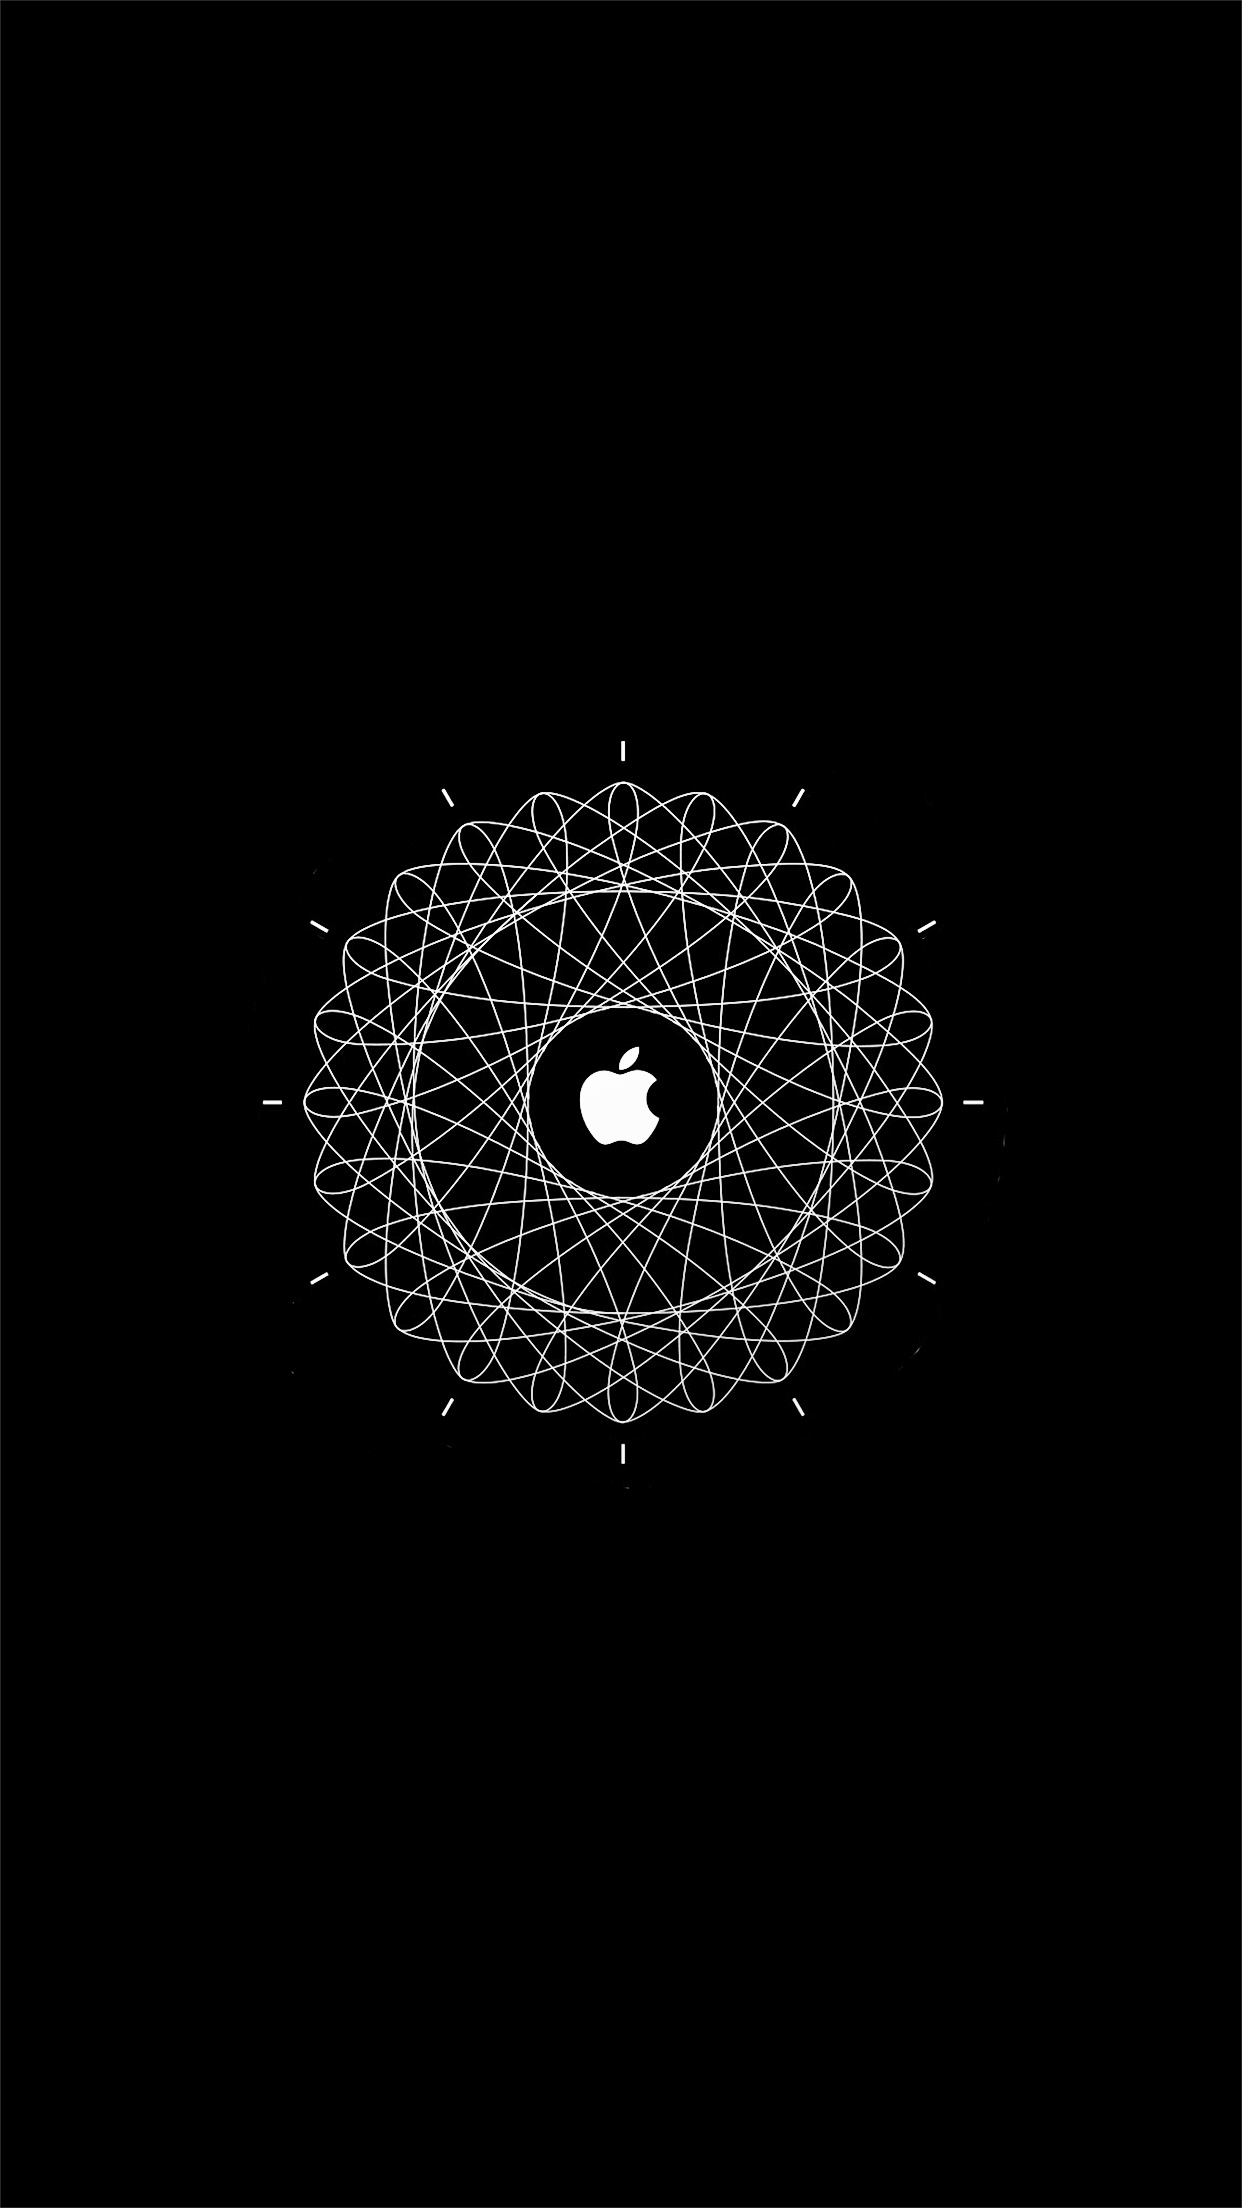 Mandala Wallpaper Iphone 6 Ianfuchs Apple Watch Animation 1 Wallpaper For Iphone X 8